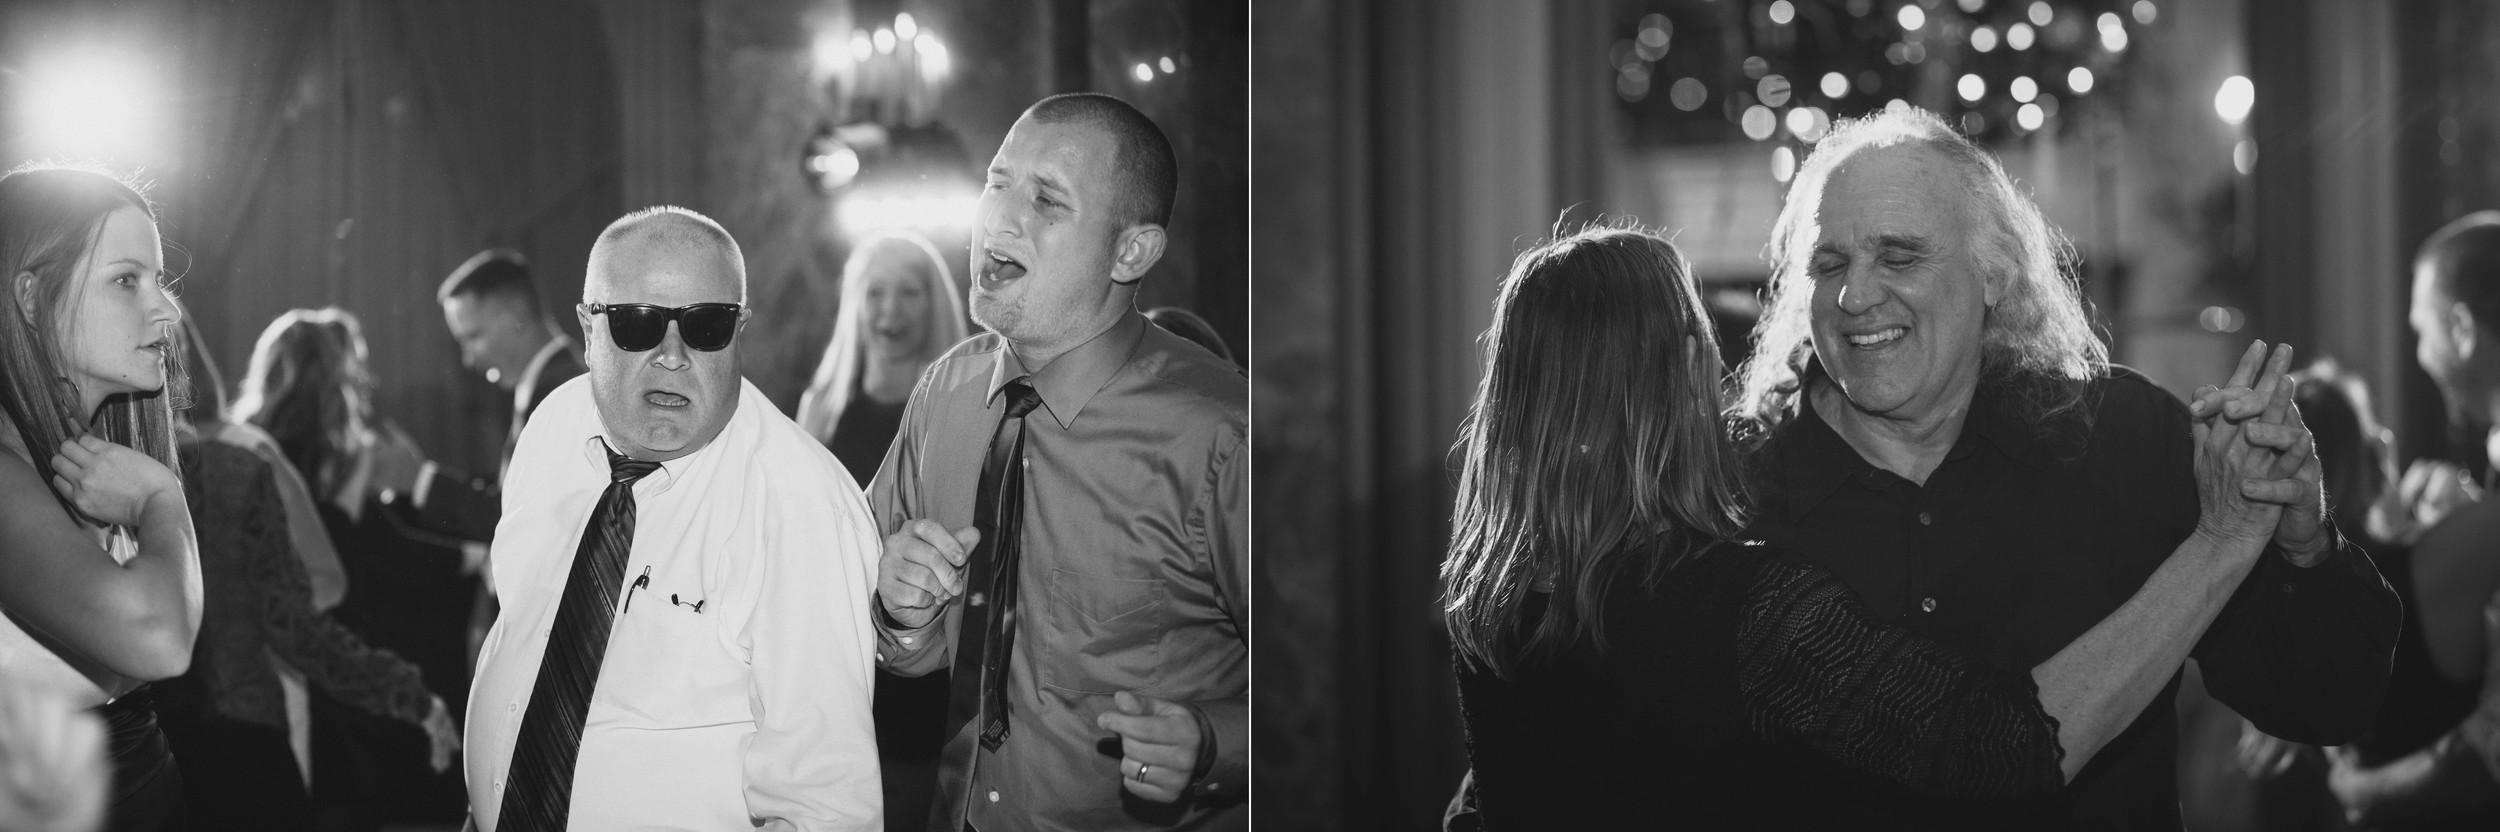 St Louis Wedding Photography-1105 copy.jpg